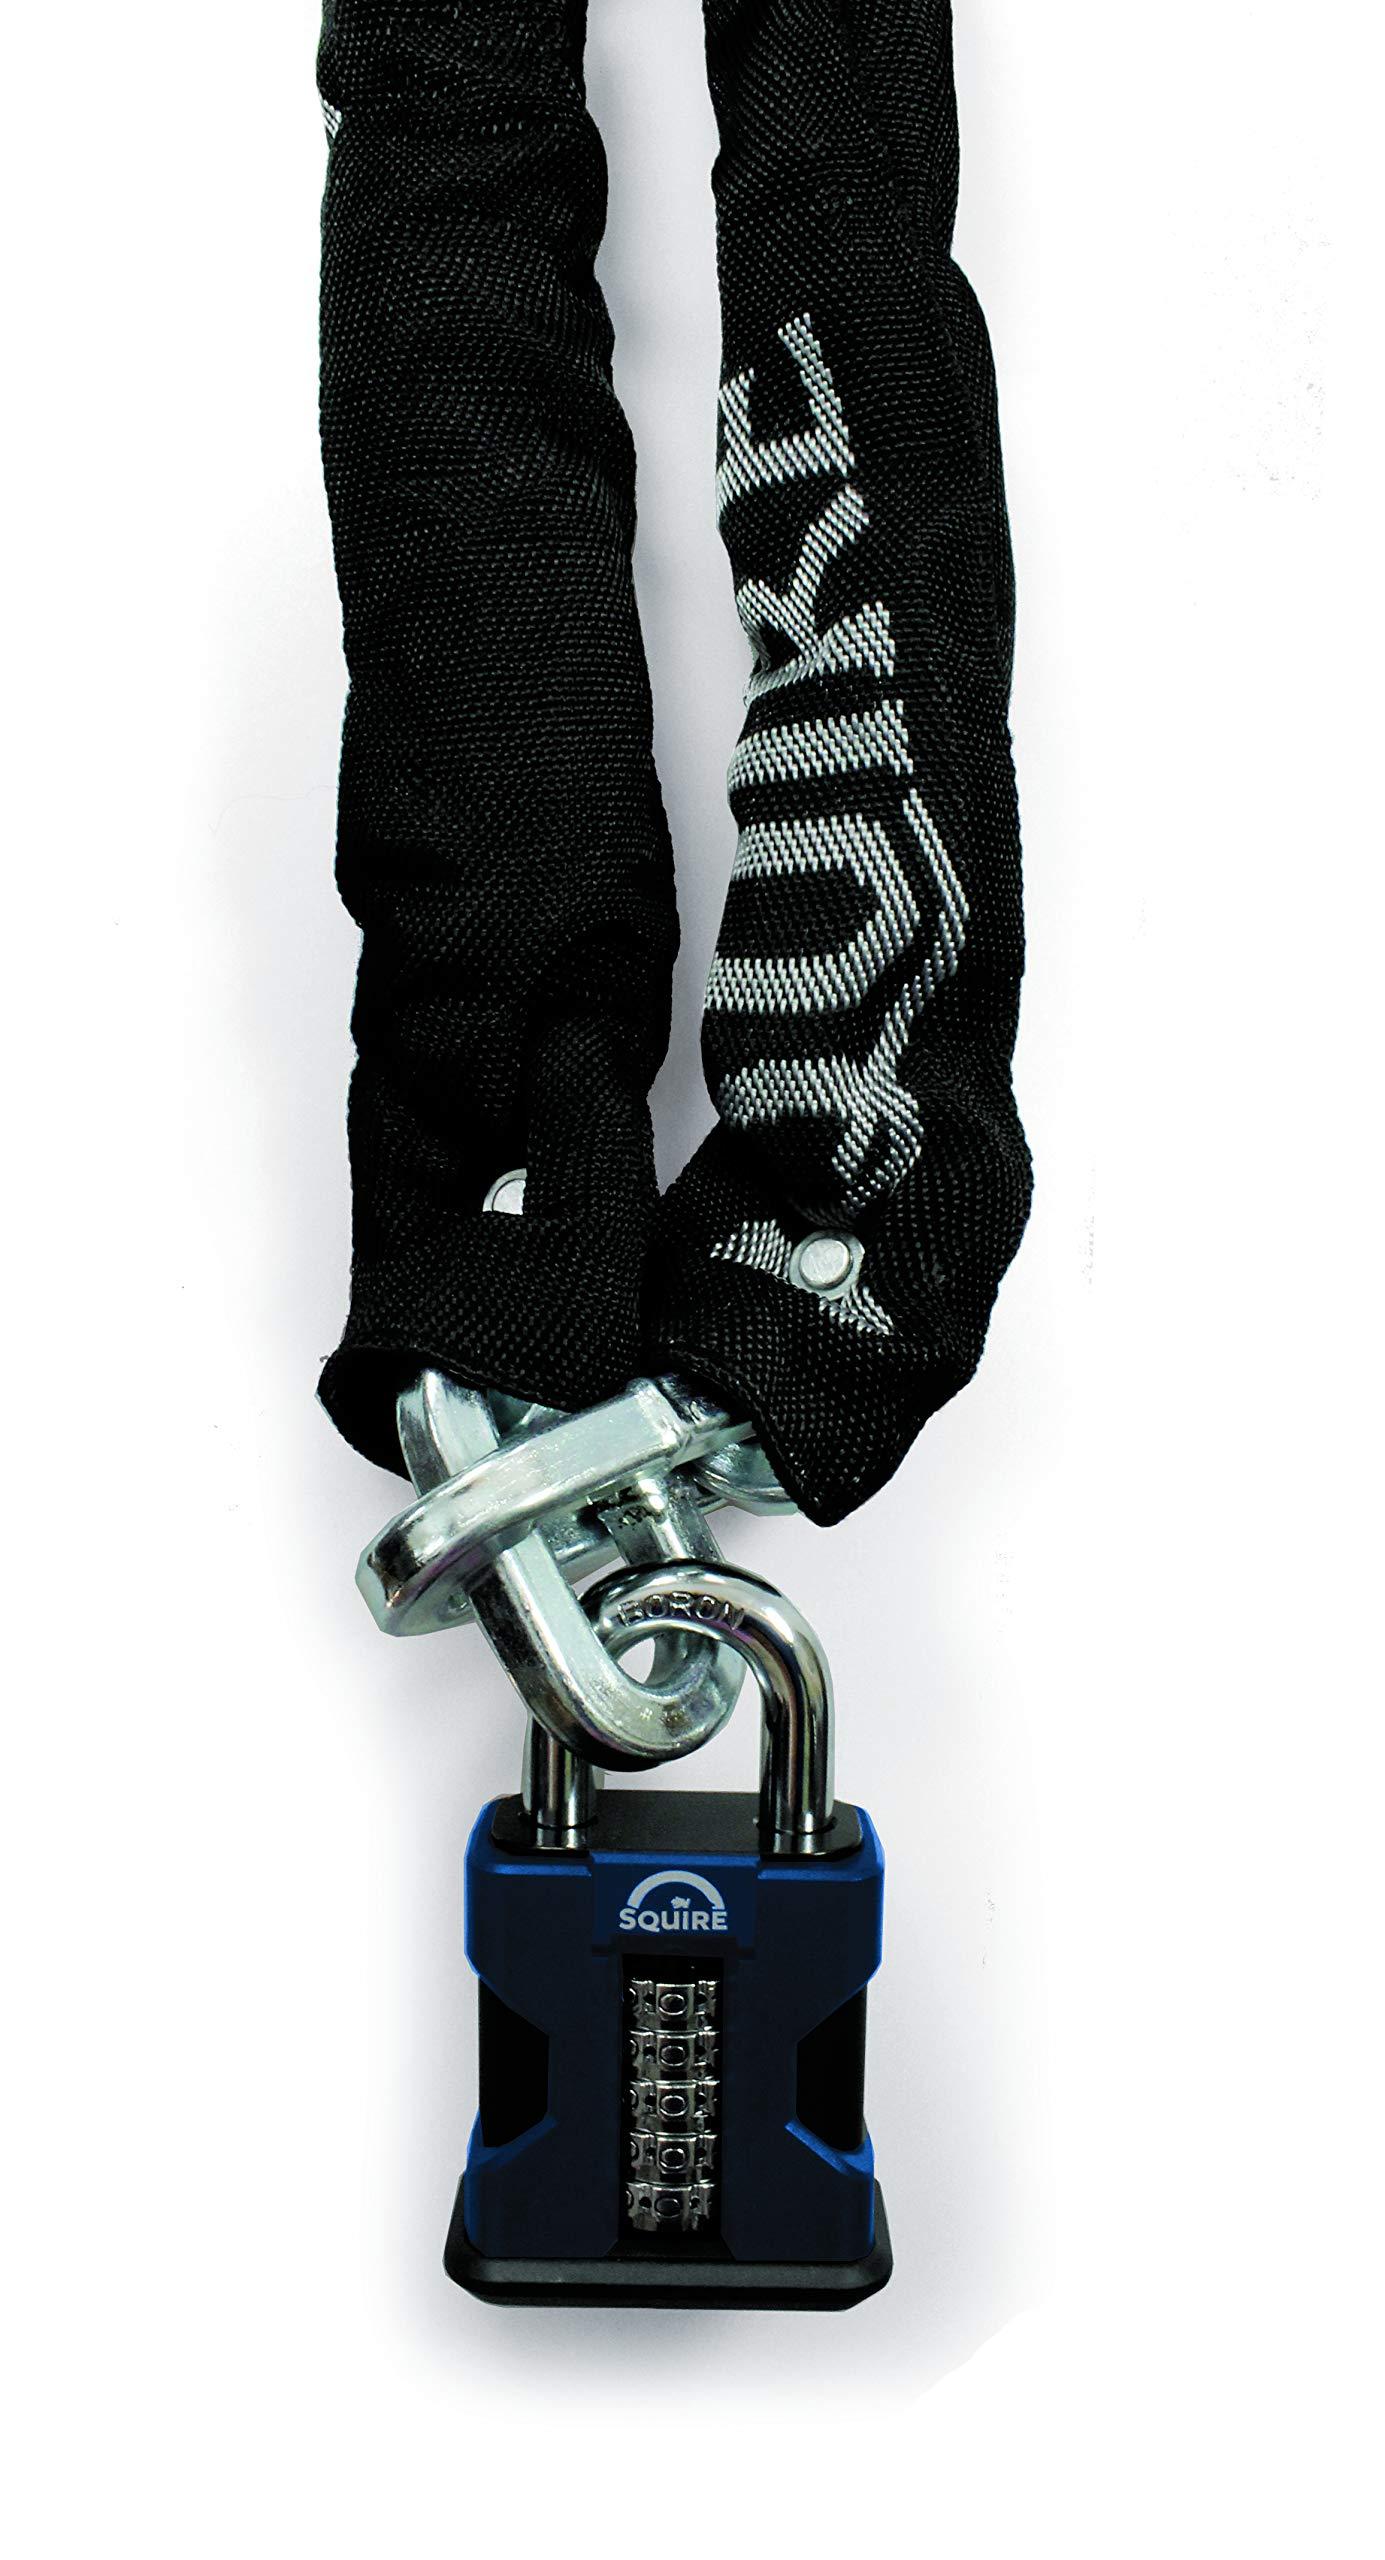 Squire SS50/G3Combi Chain Lock